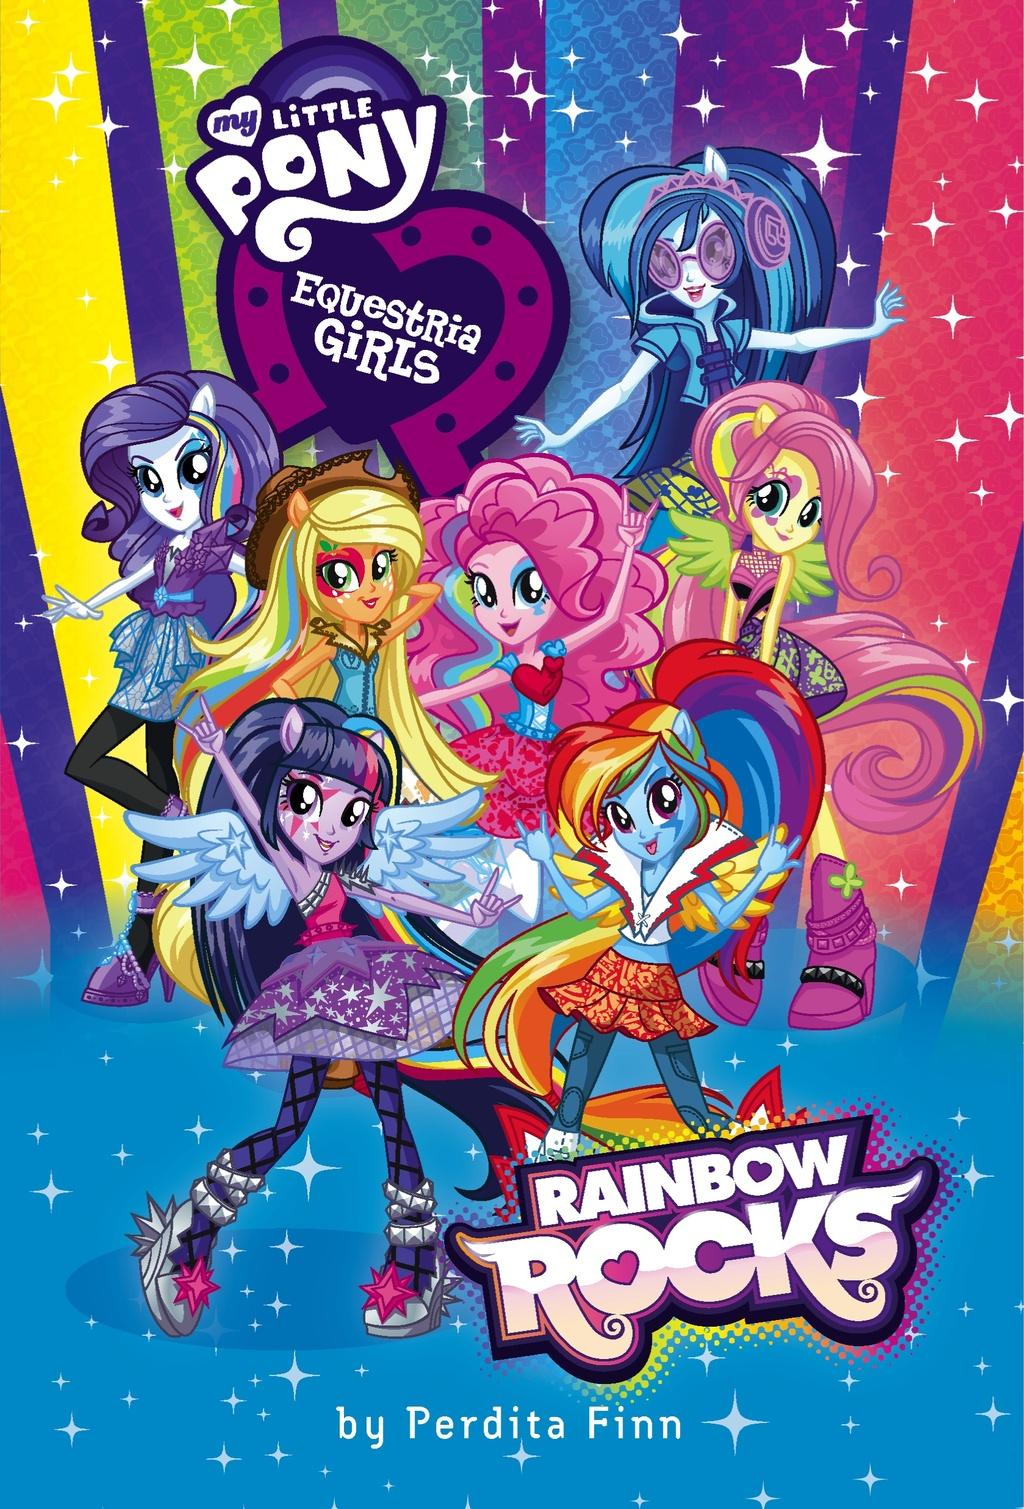 My little Pony The Movie : Equestria Girls Rainbow Rocks (2014) มายลิตเติ้ลโพนี่ เดอะมูวี่ ภาค ก๊วนสาวร็อคแห่งอเควสเทรีย